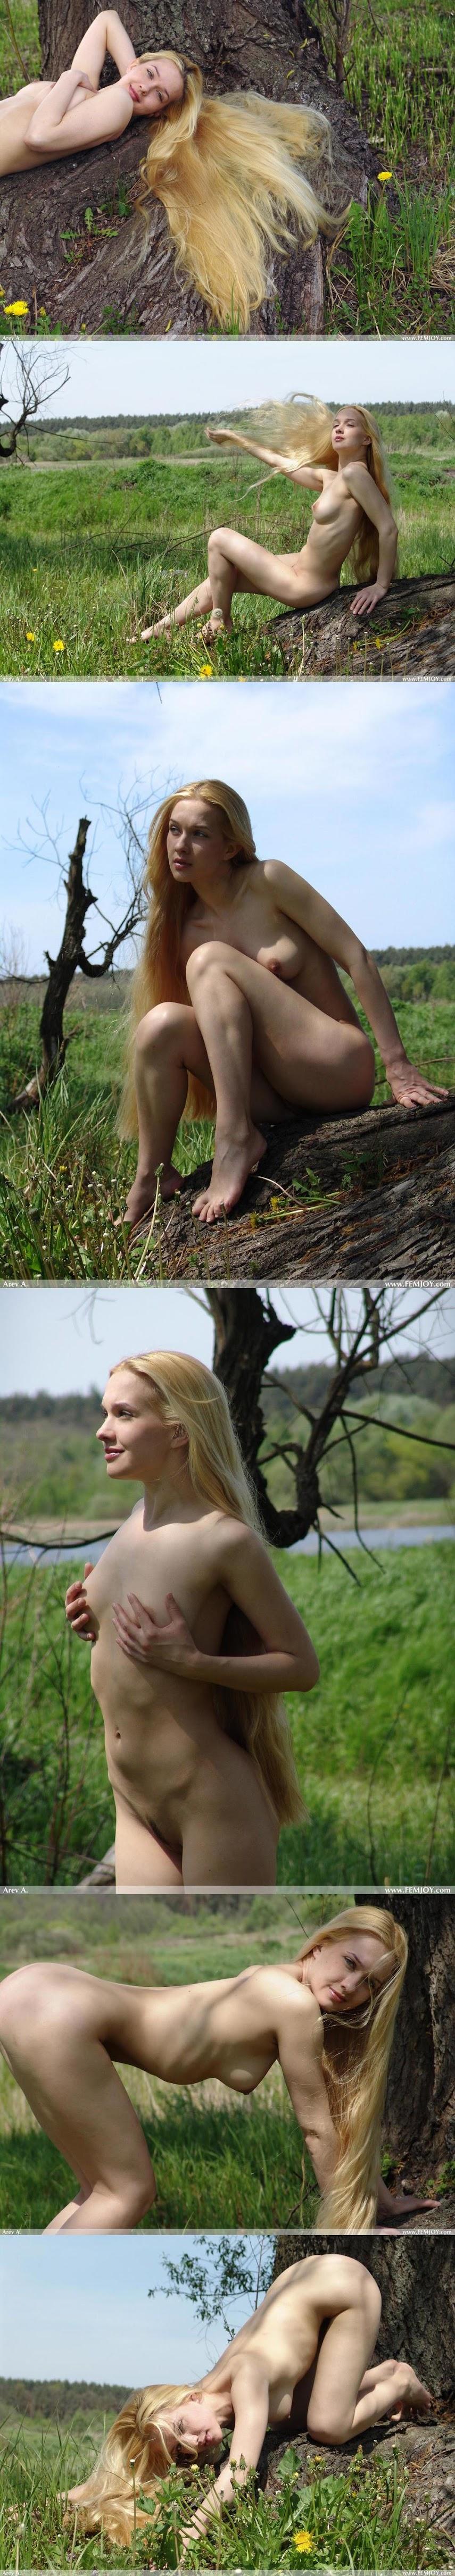 FEdf  - 2005-09-04 - Desiree - Pure Nude x55 3000px